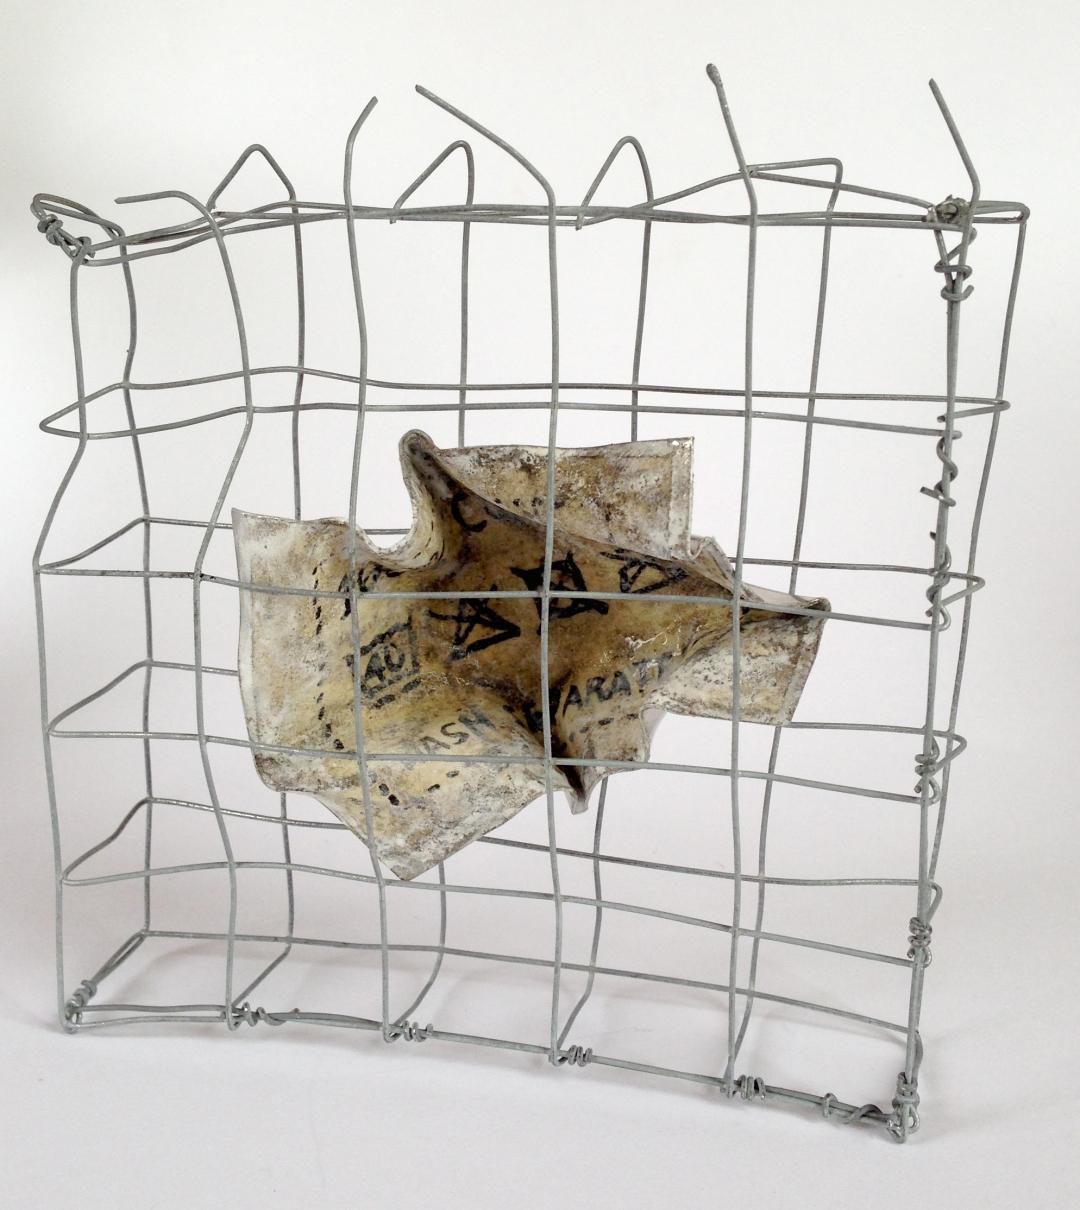 mark lomax 1964 caged 02